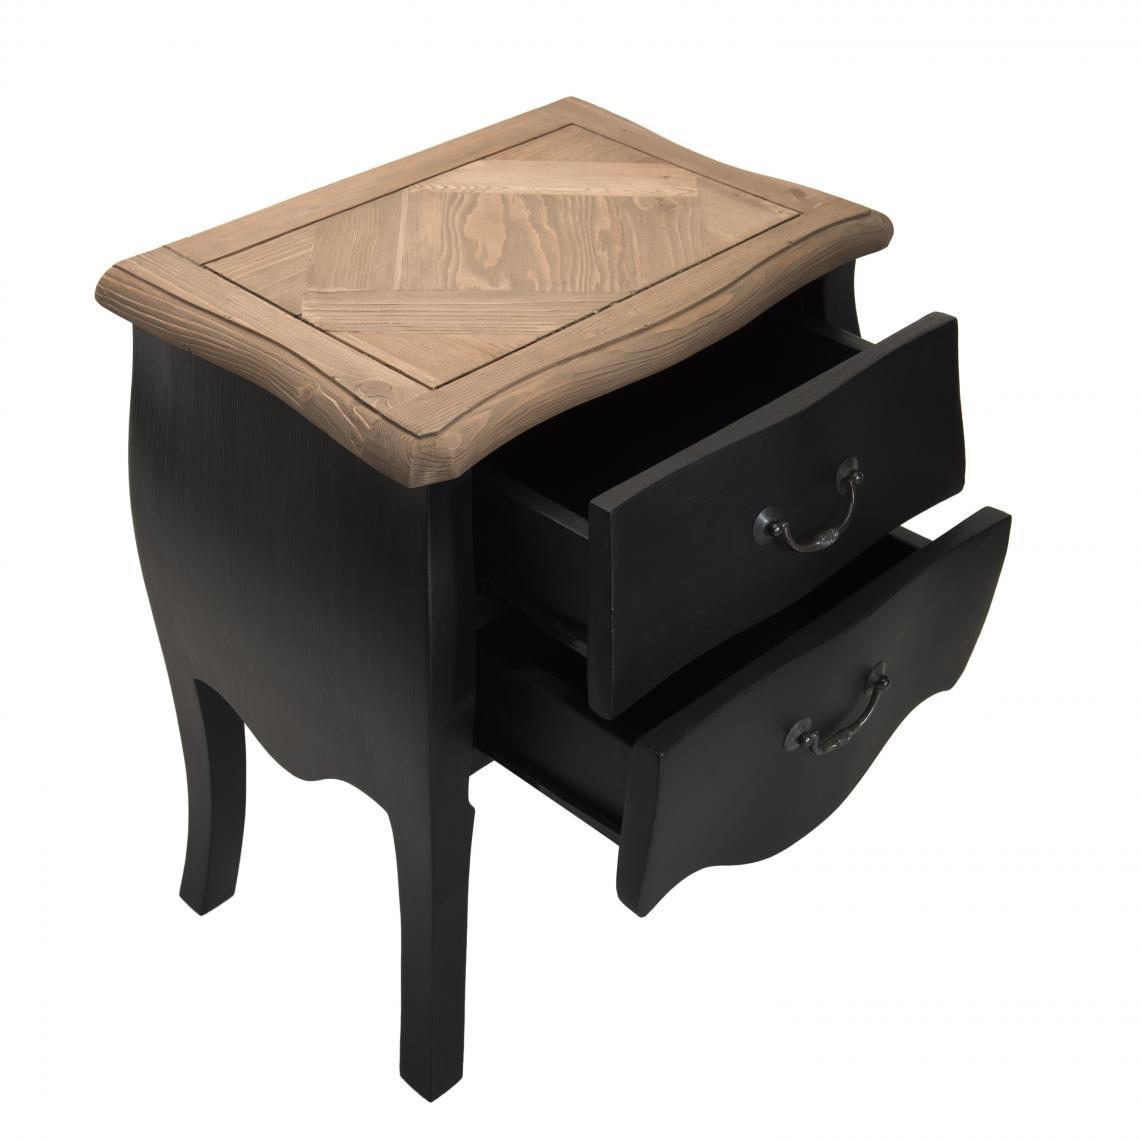 Table de Chevet Noire 6 Tiroirs en Pin Vieilli LAND MACABANE  6